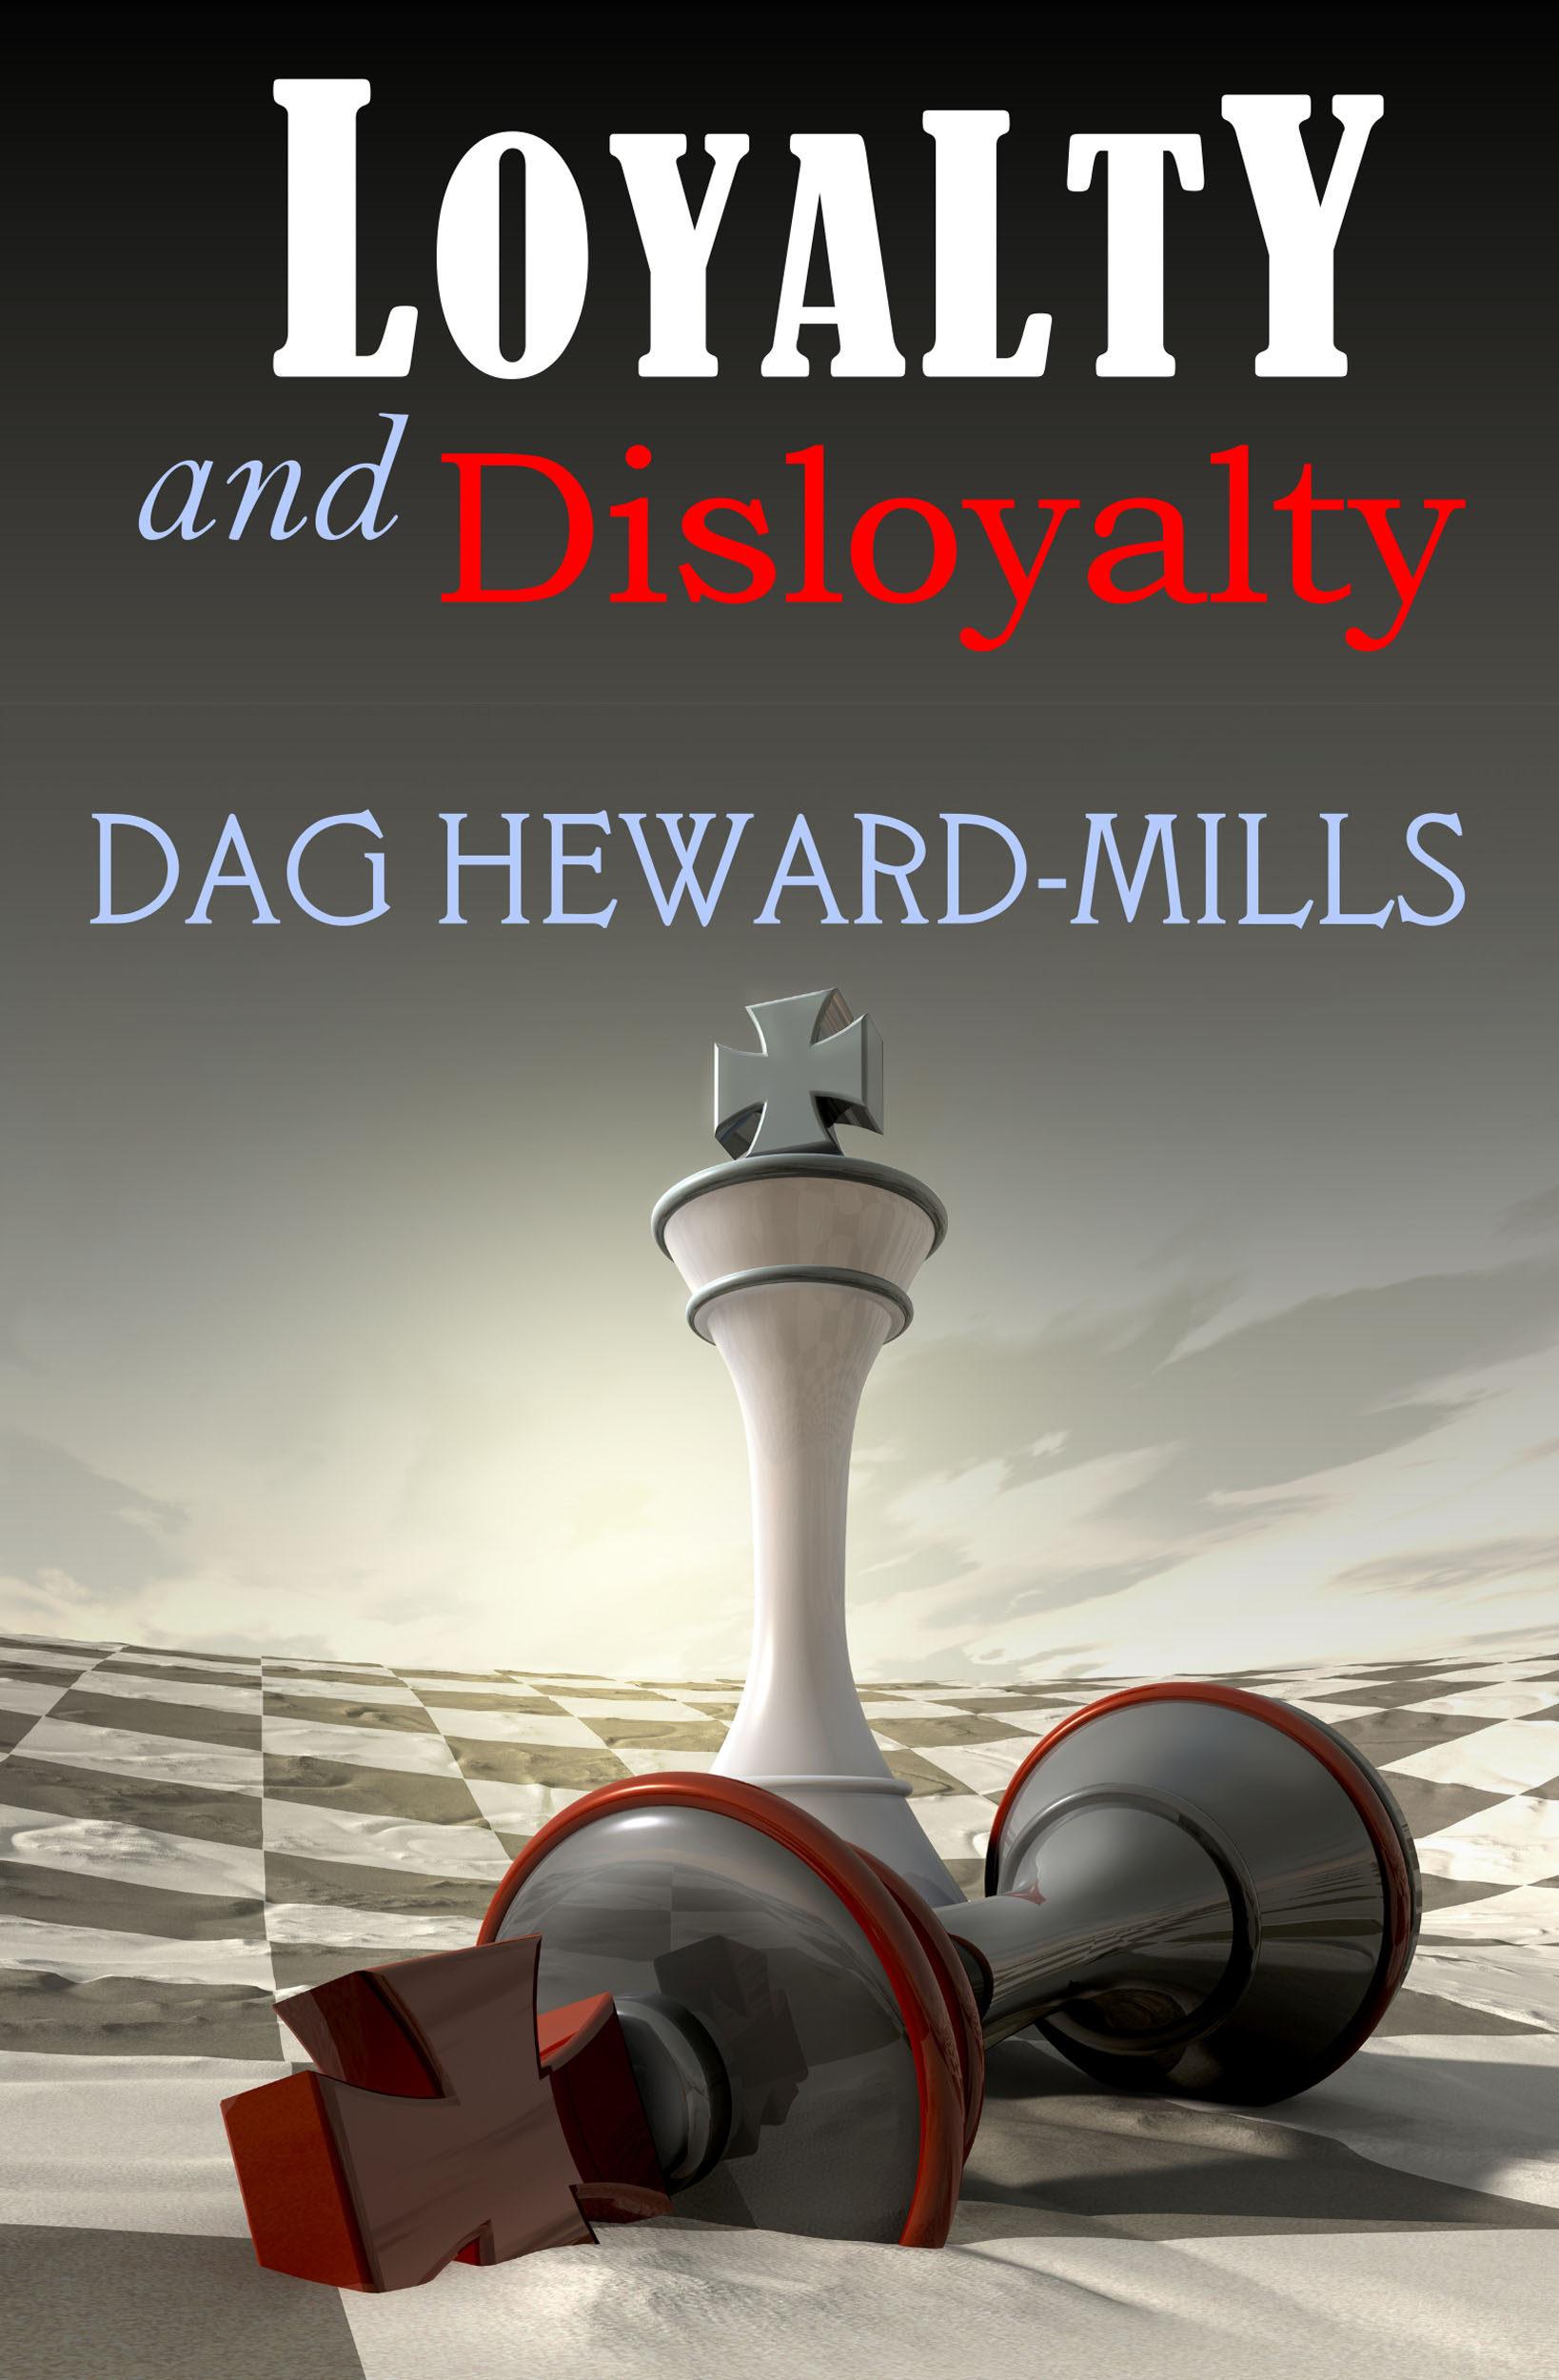 Loyalty disloyalty ebook dag heward mills descargar libro pdf loyalty disloyalty ebook dag heward mills 9781909278370 fandeluxe Images